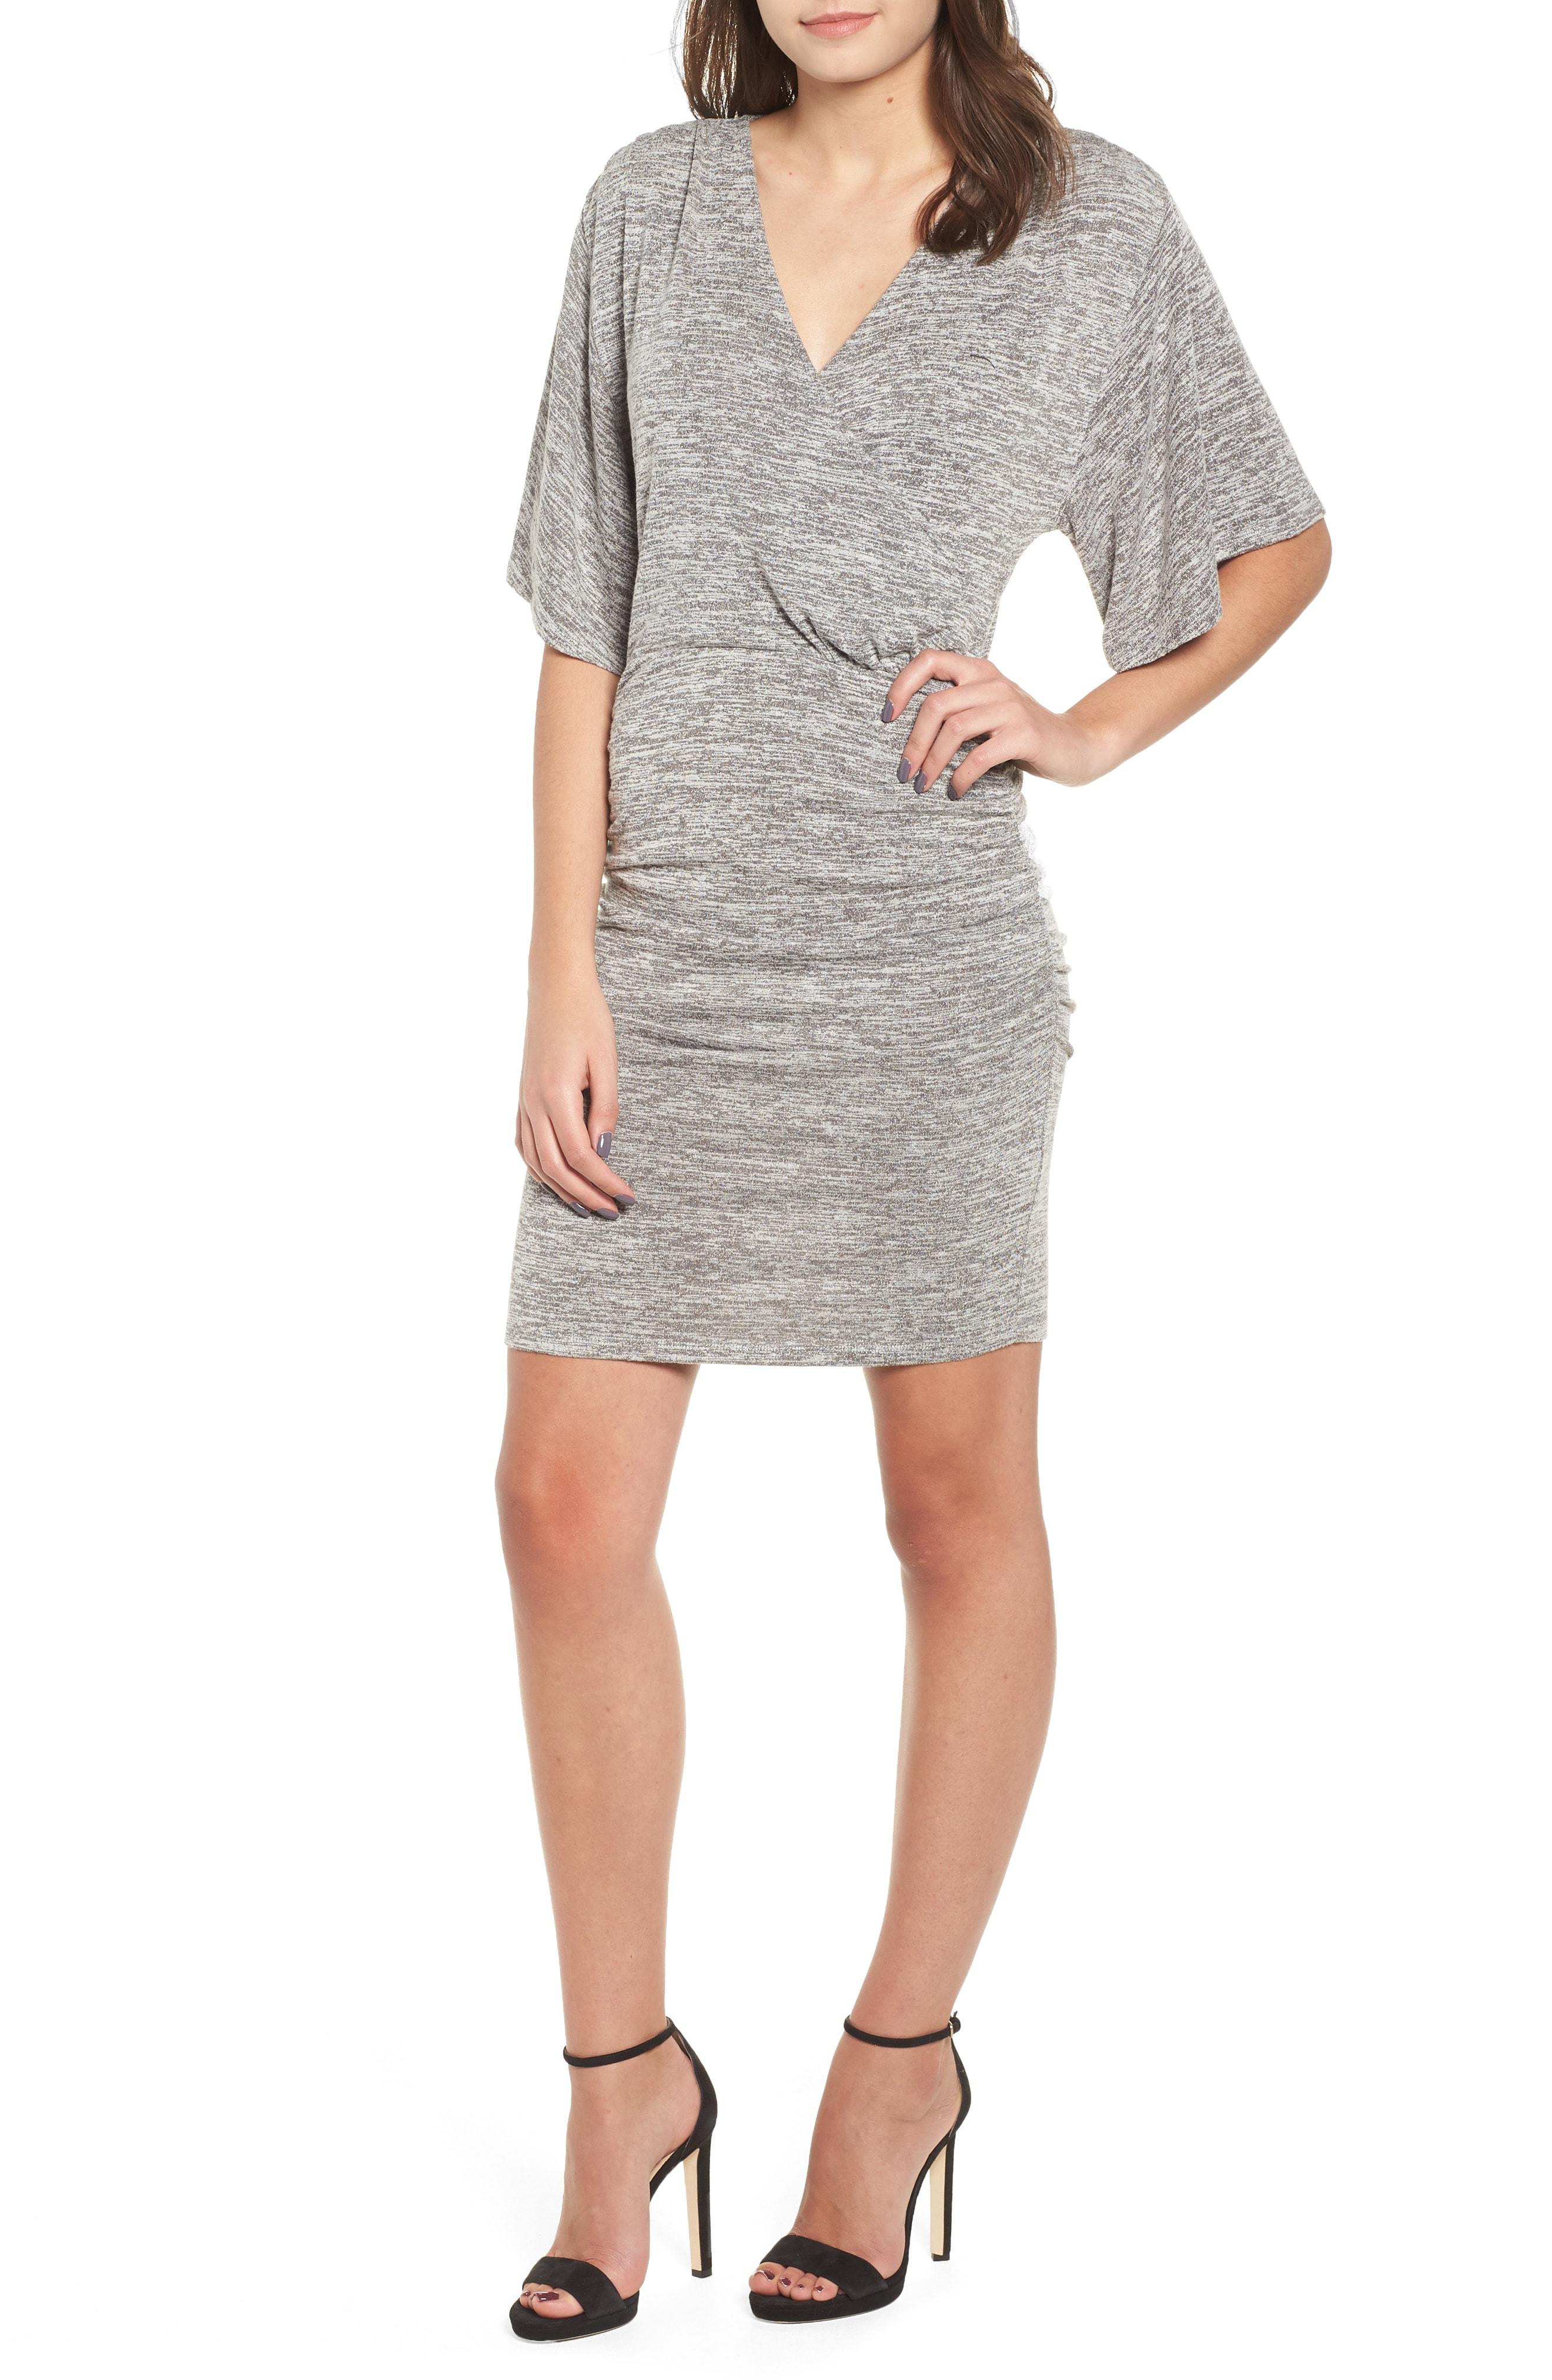 Leith Wrap Dress (Regular & Plus Size)